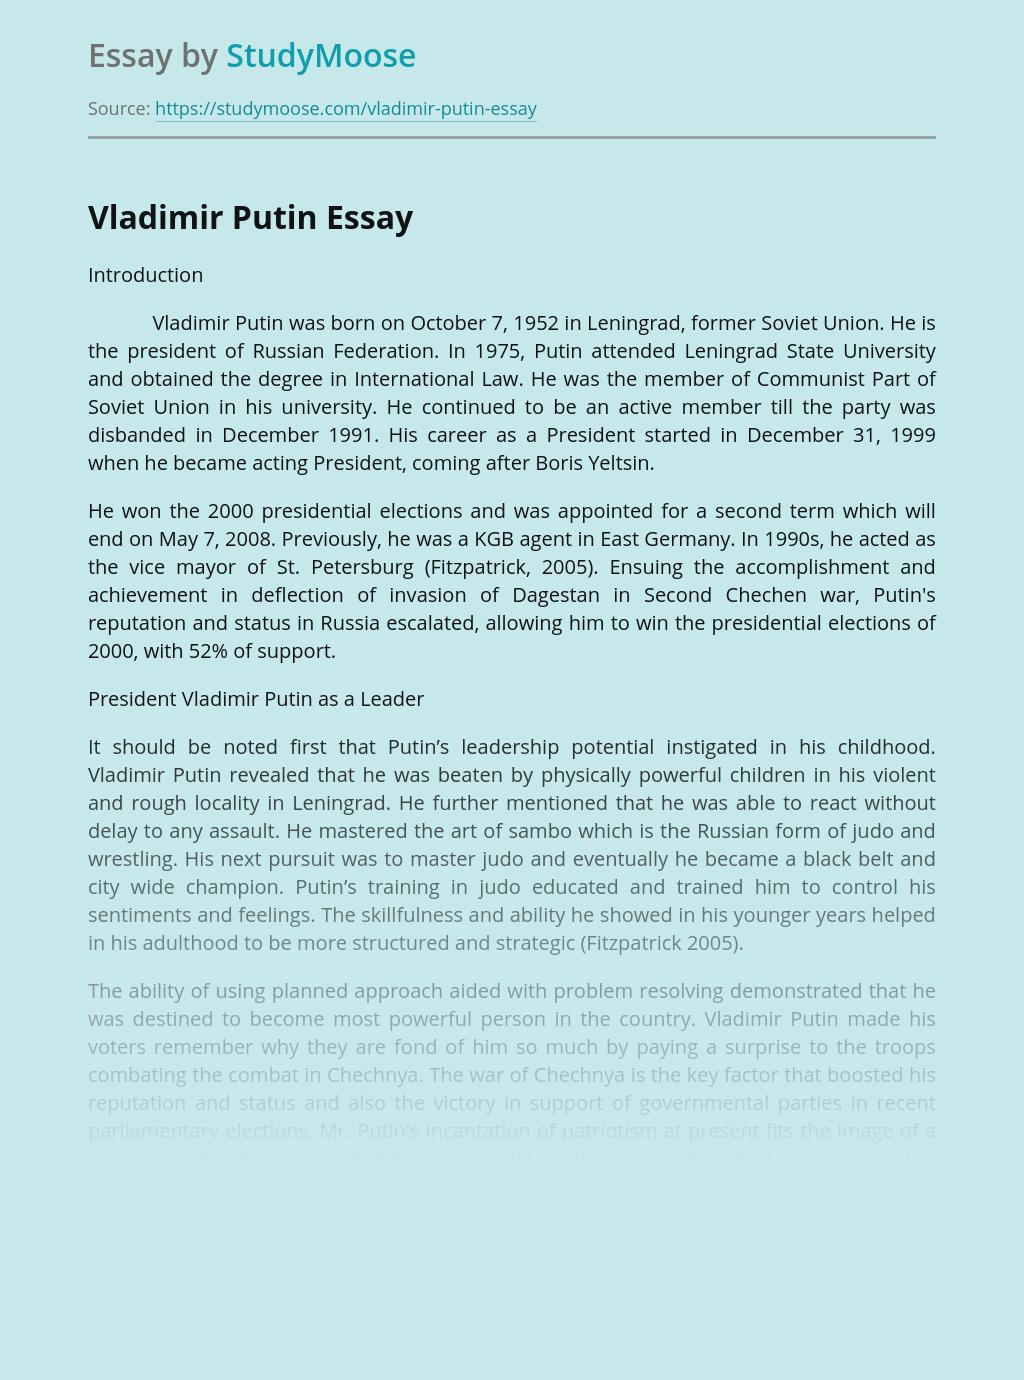 Famous Person - Vladimir Putin